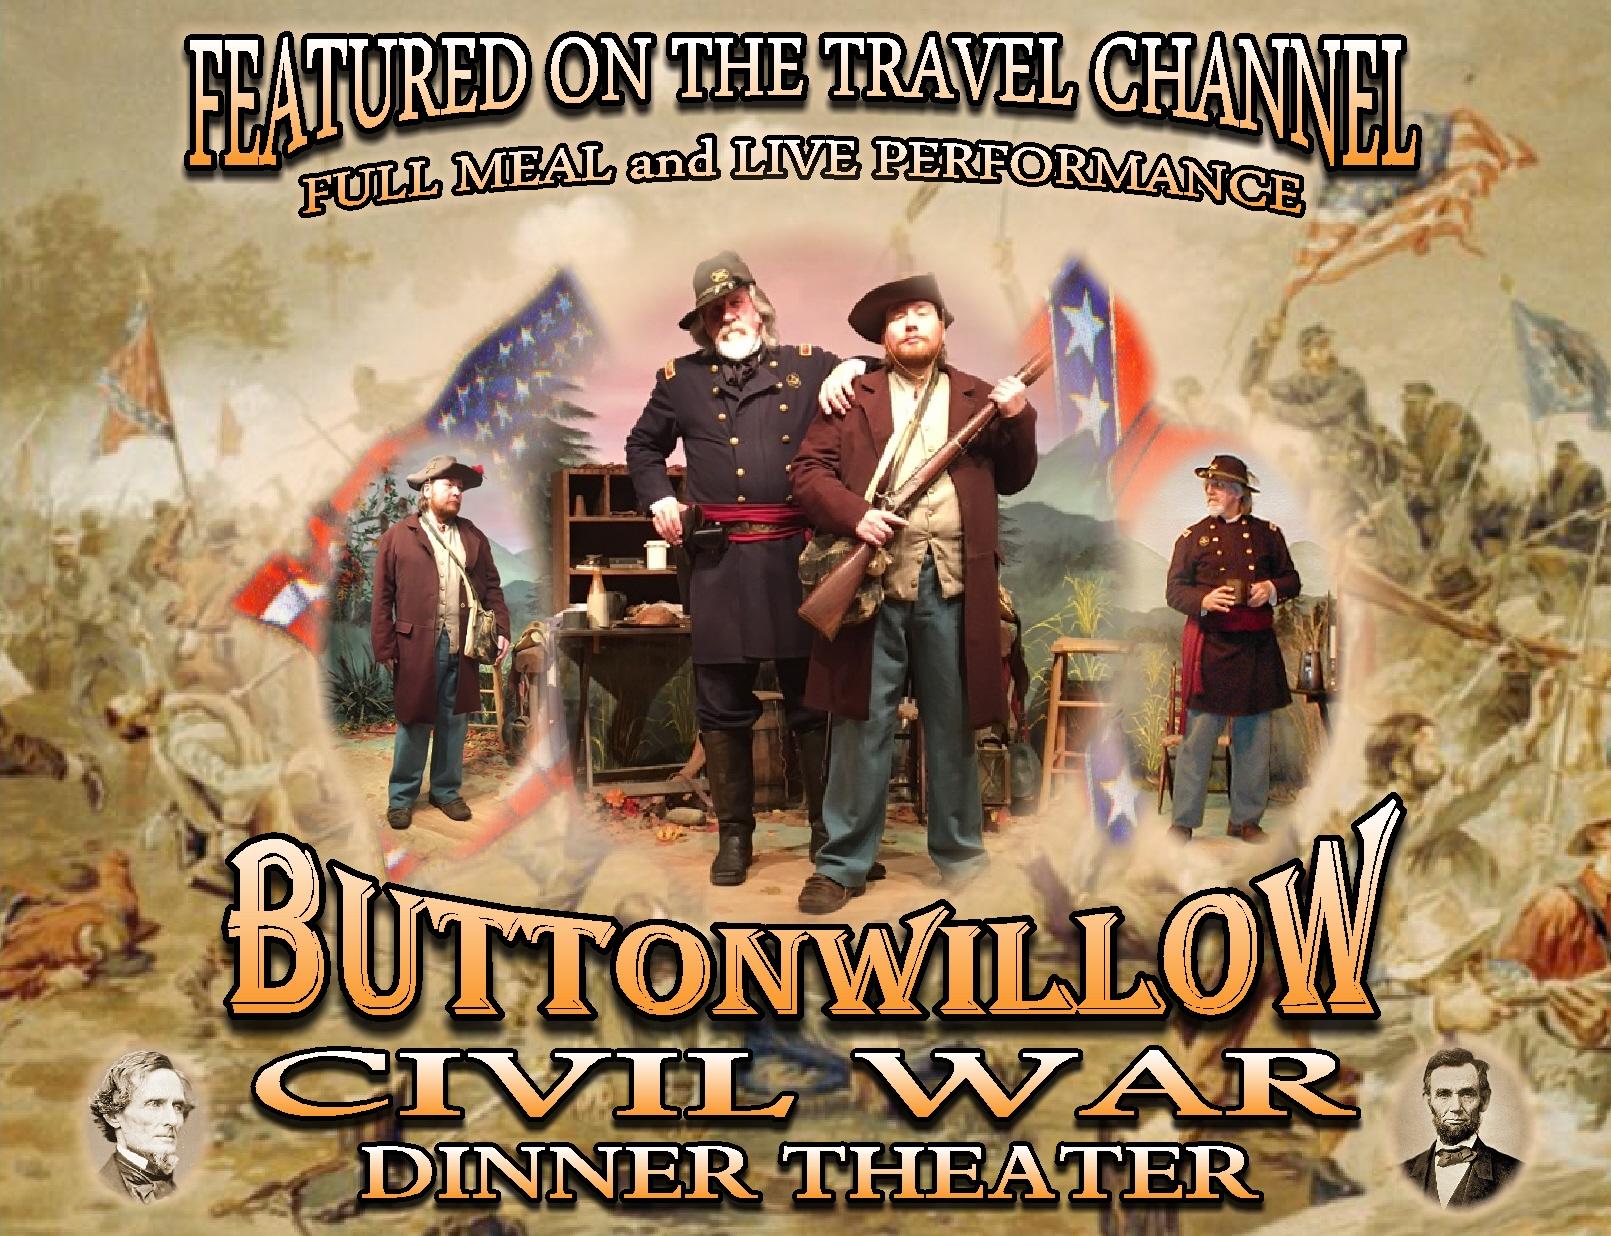 Buttonwillow Civil War Dinner Theater image 3